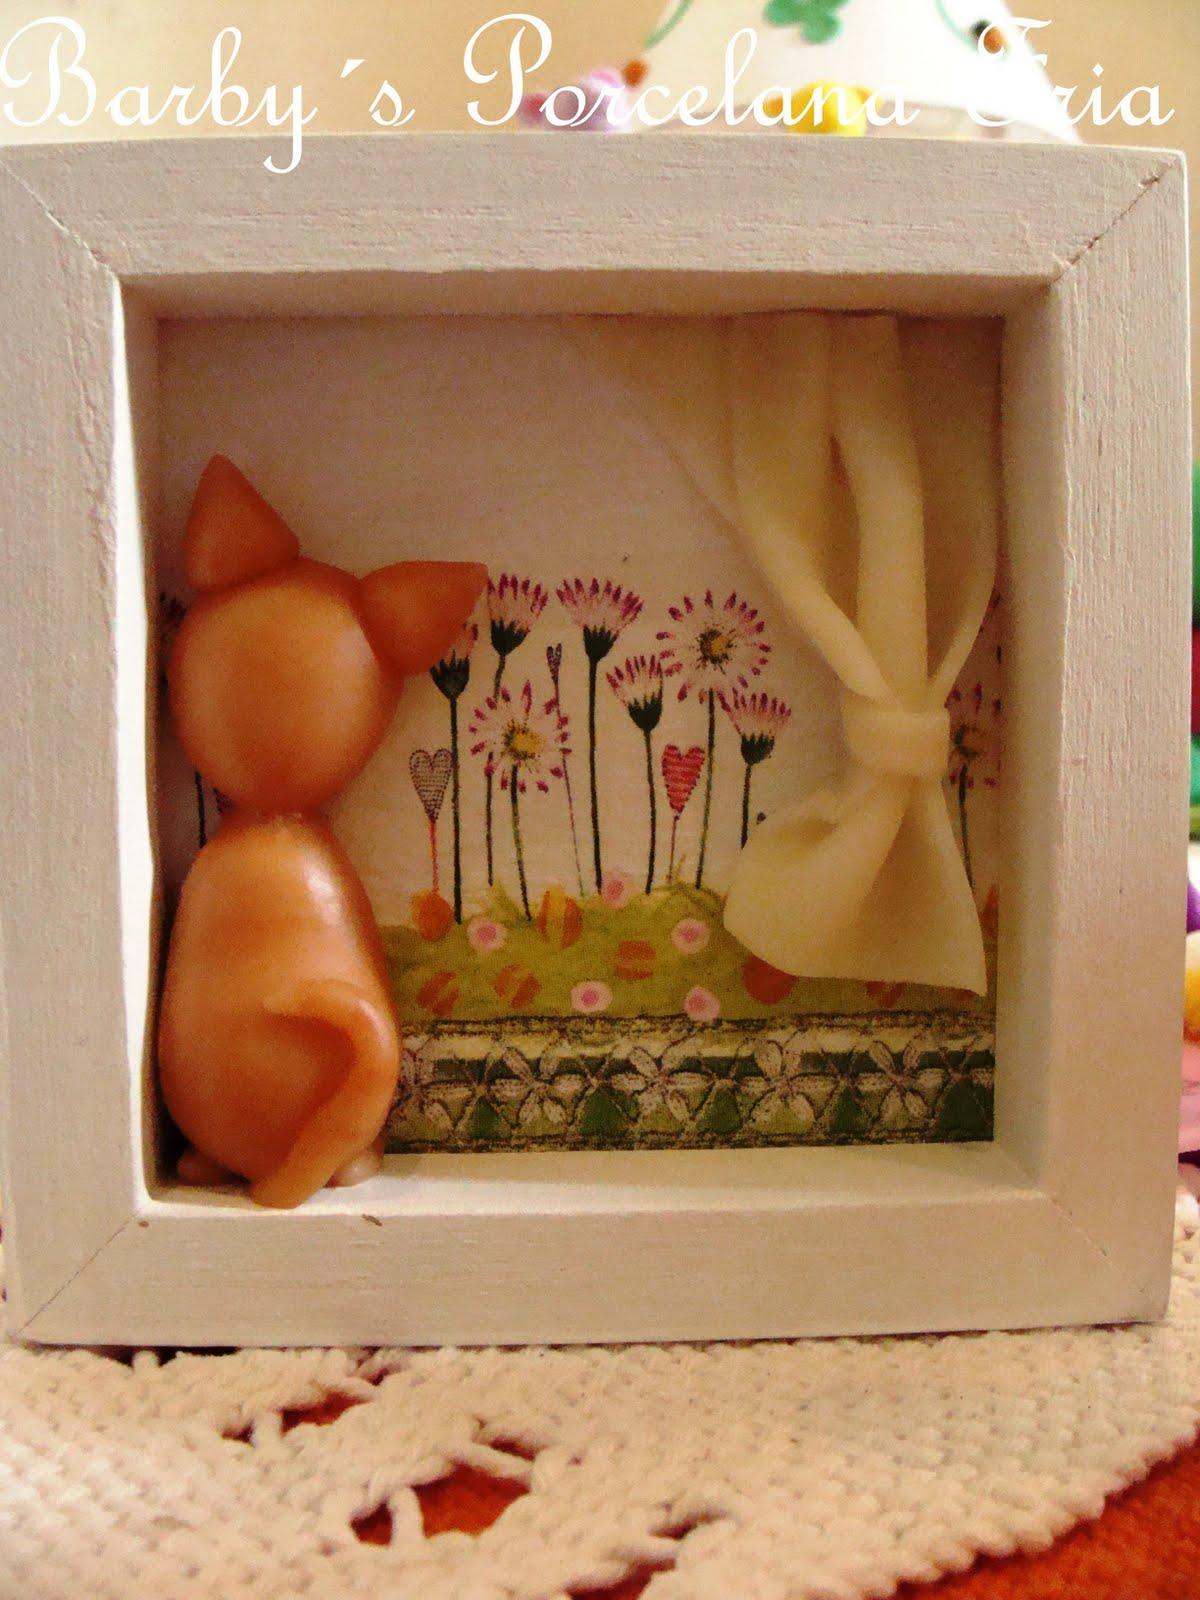 Barbys Porcelana Fria cuadros decorados con Gatito